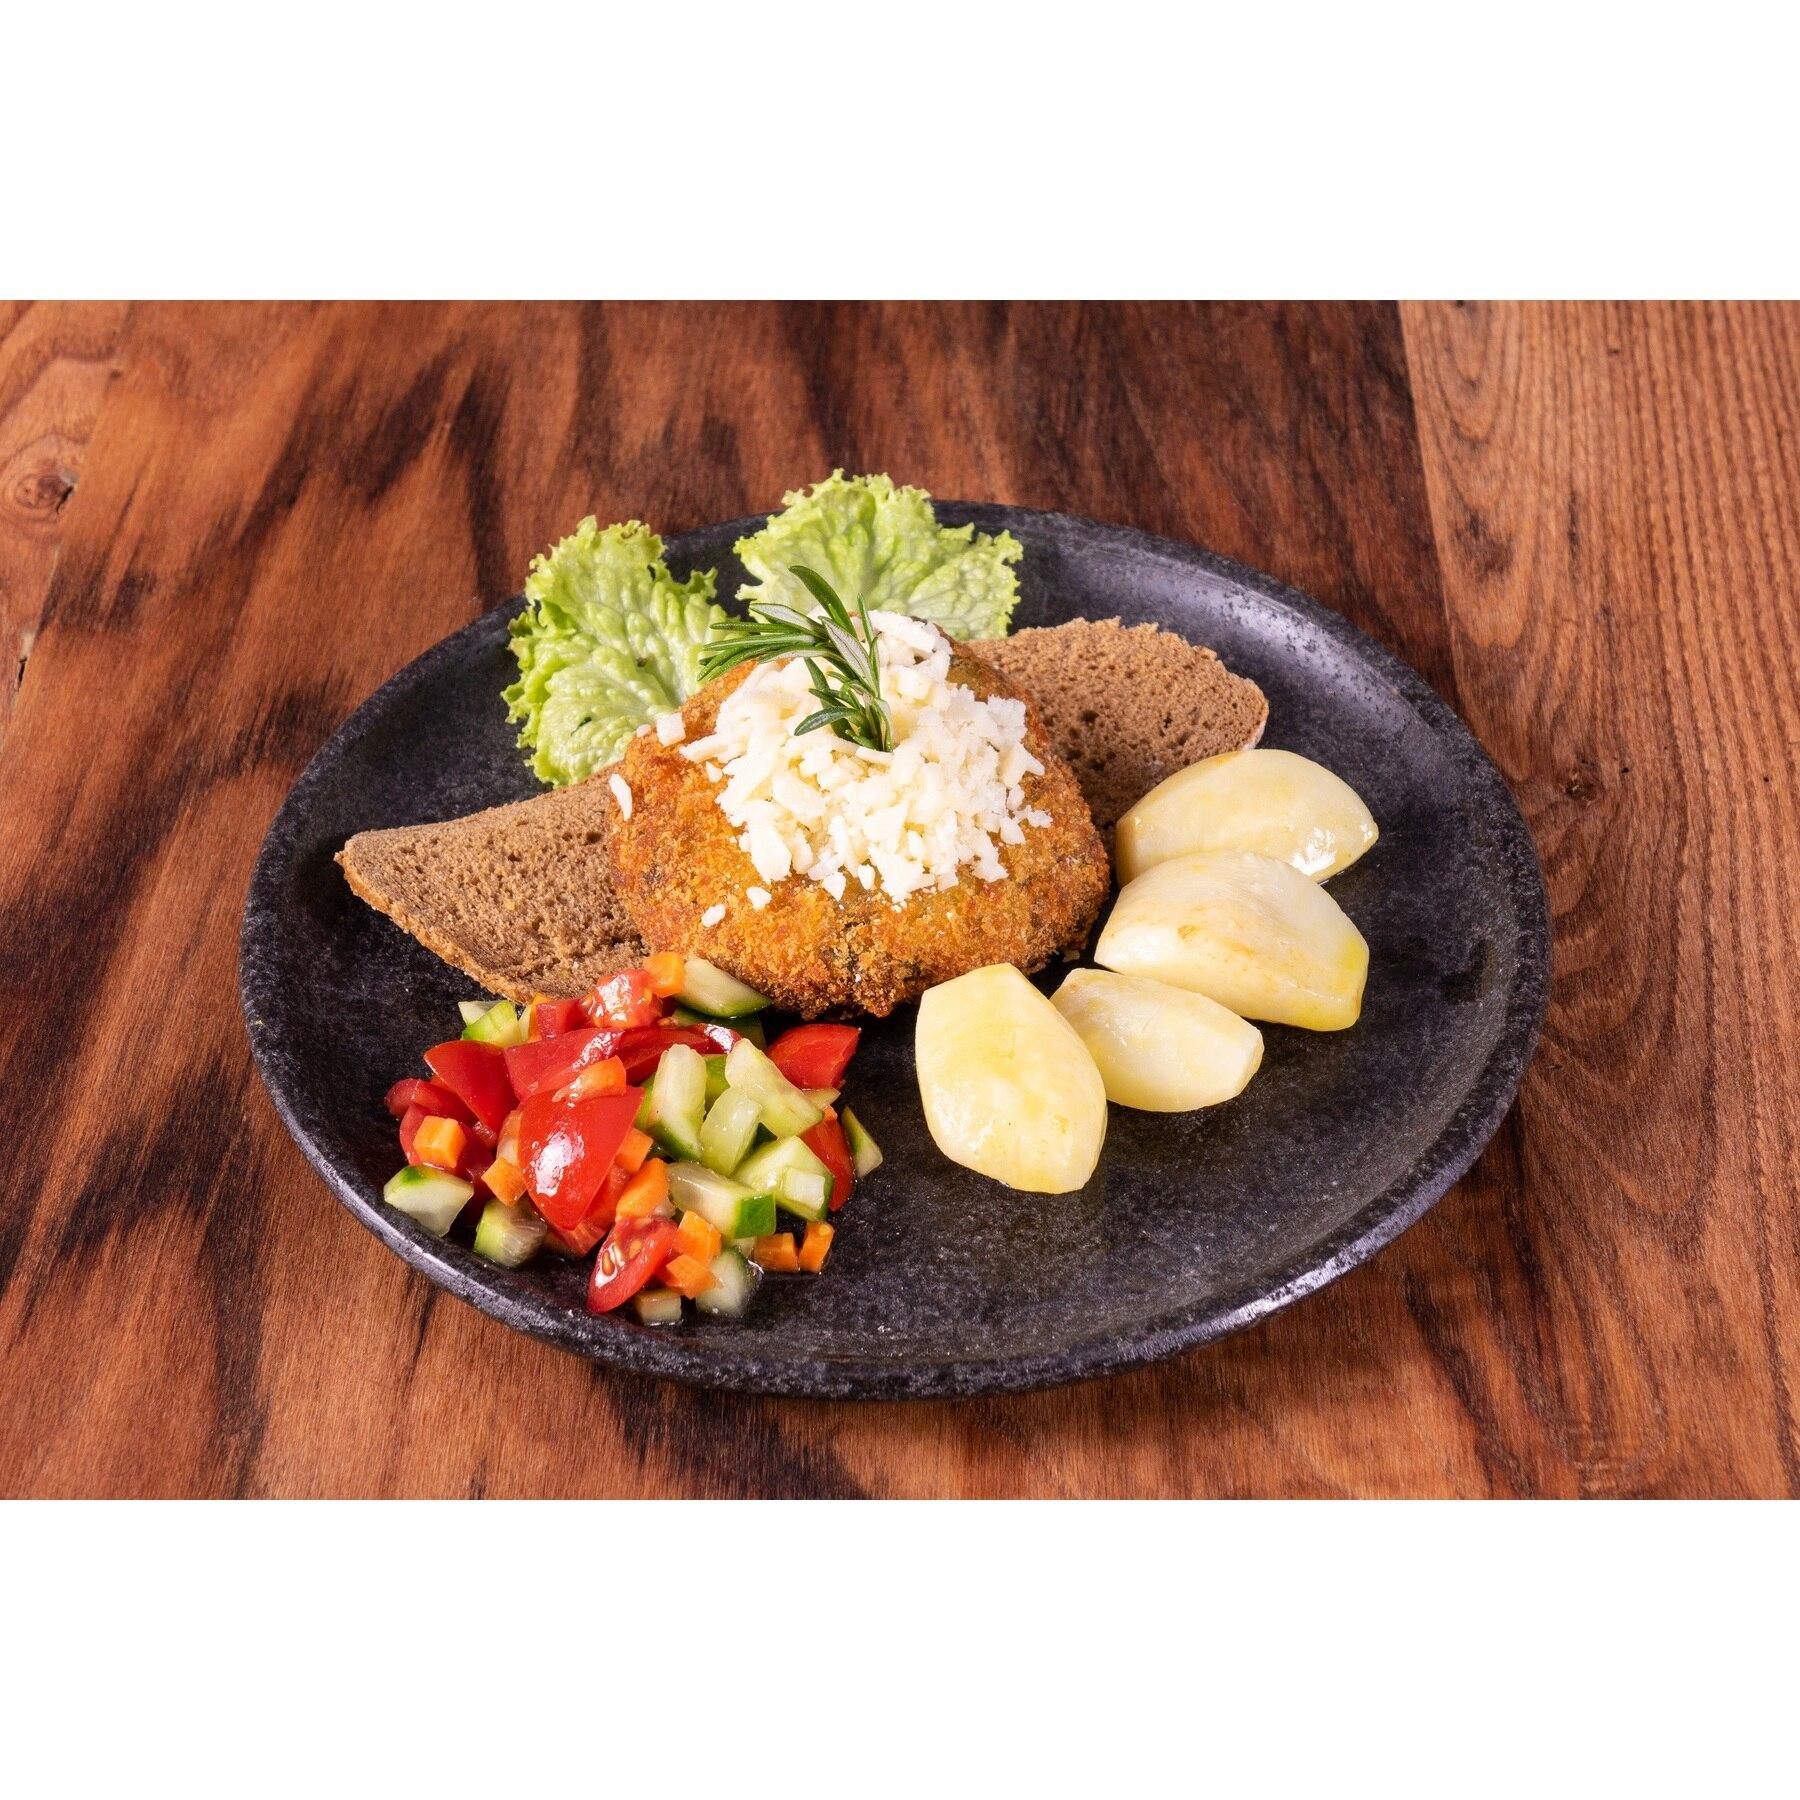 Basalt Natural Stone Plate Luxury Design High Quality Handmade Basalt Dinner Plate